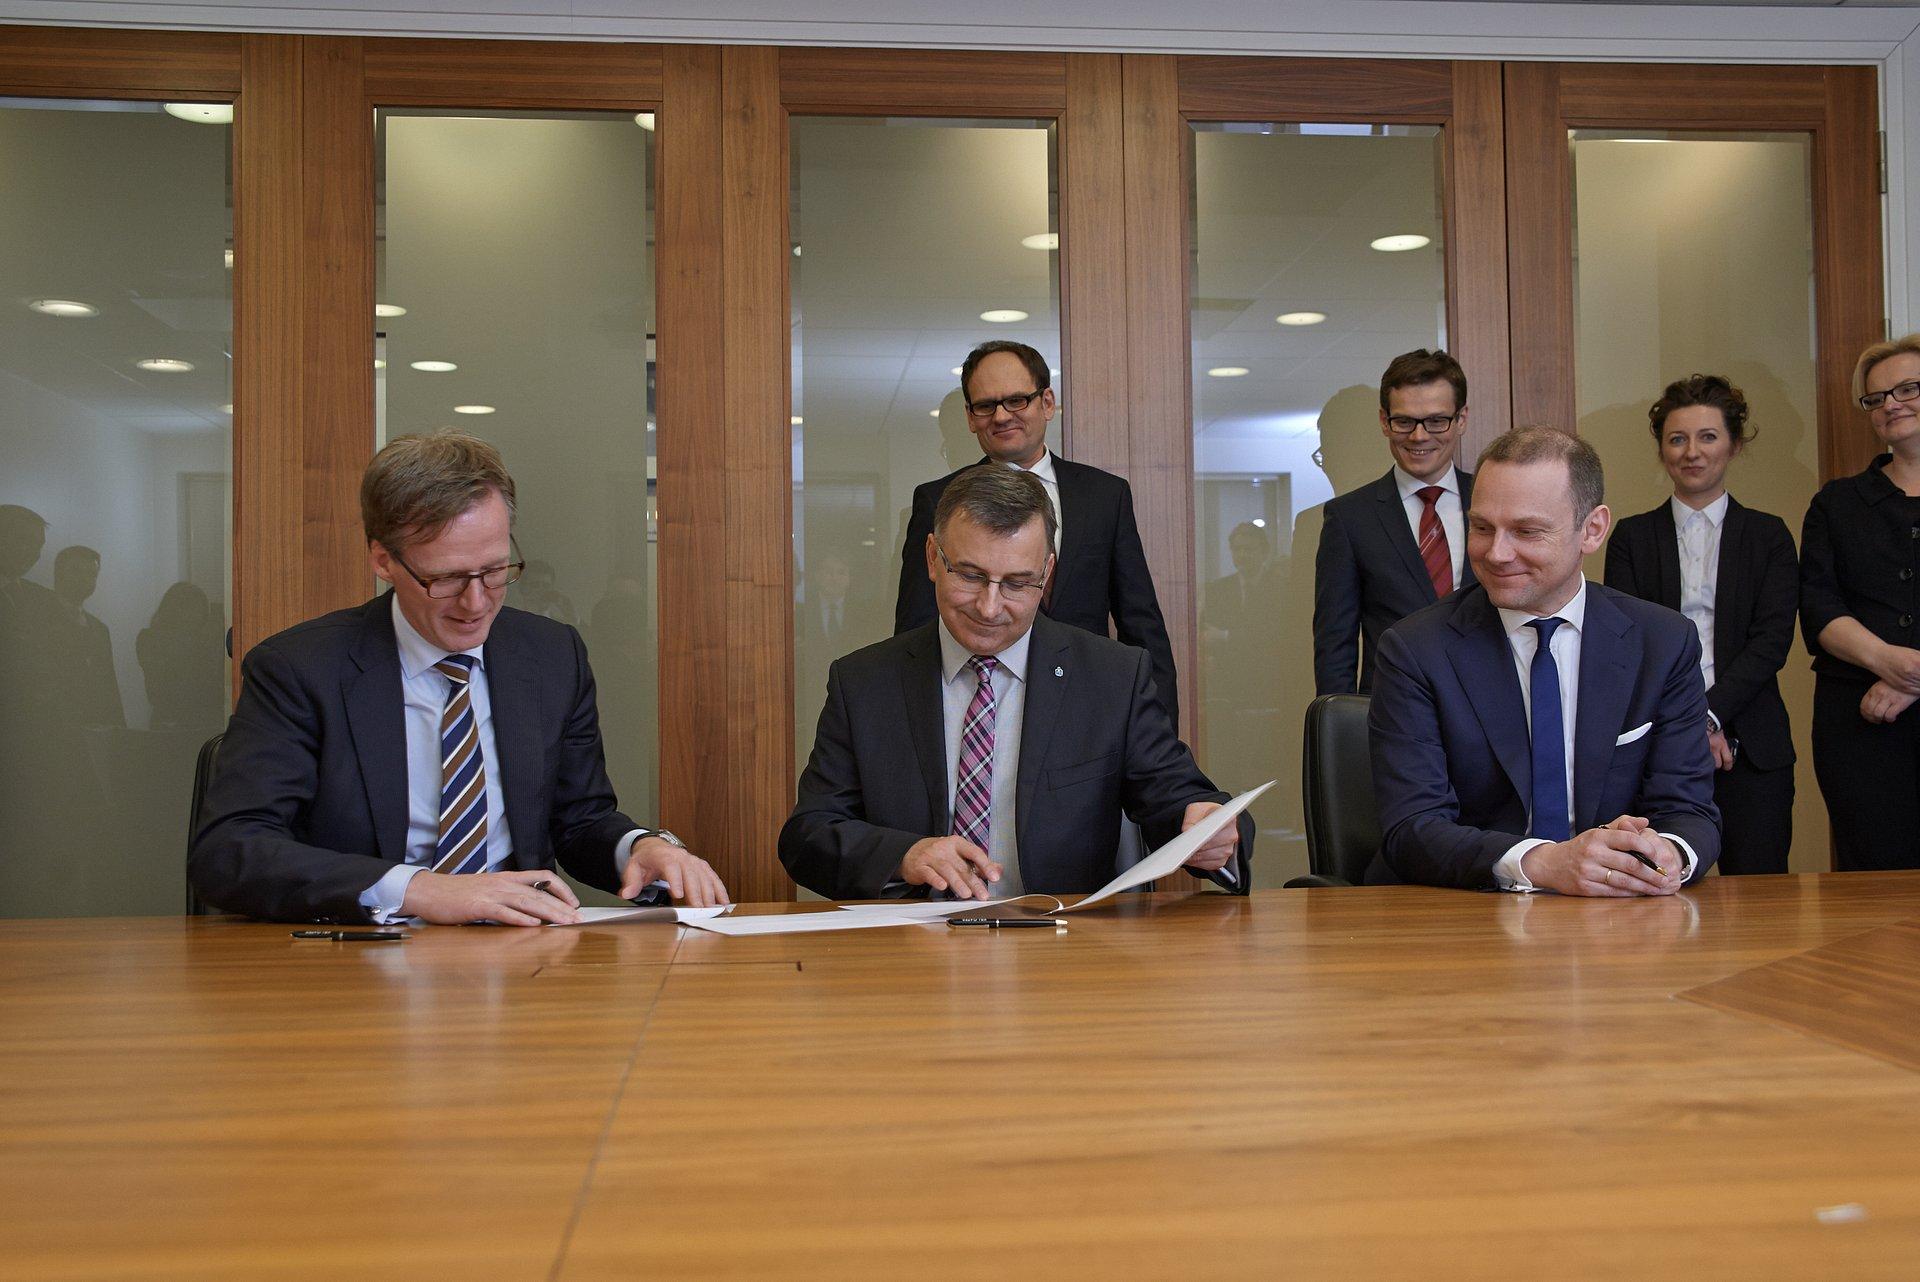 PKO BANK POLSKI TAKES OVER NORDEA'S ASSETS